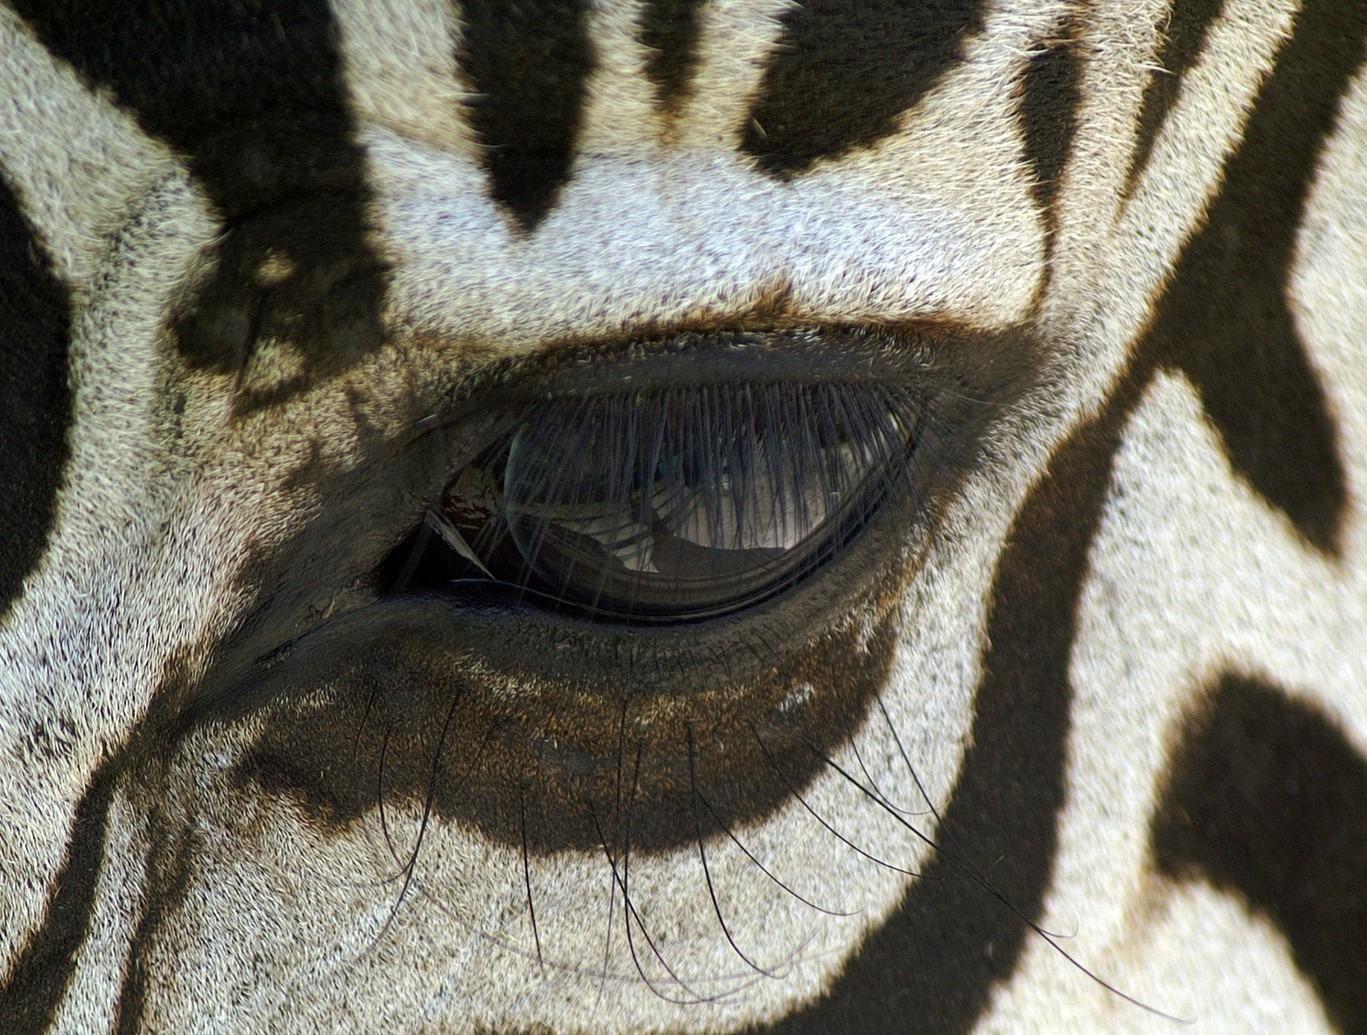 Zebra. Zdroj: Pixabay